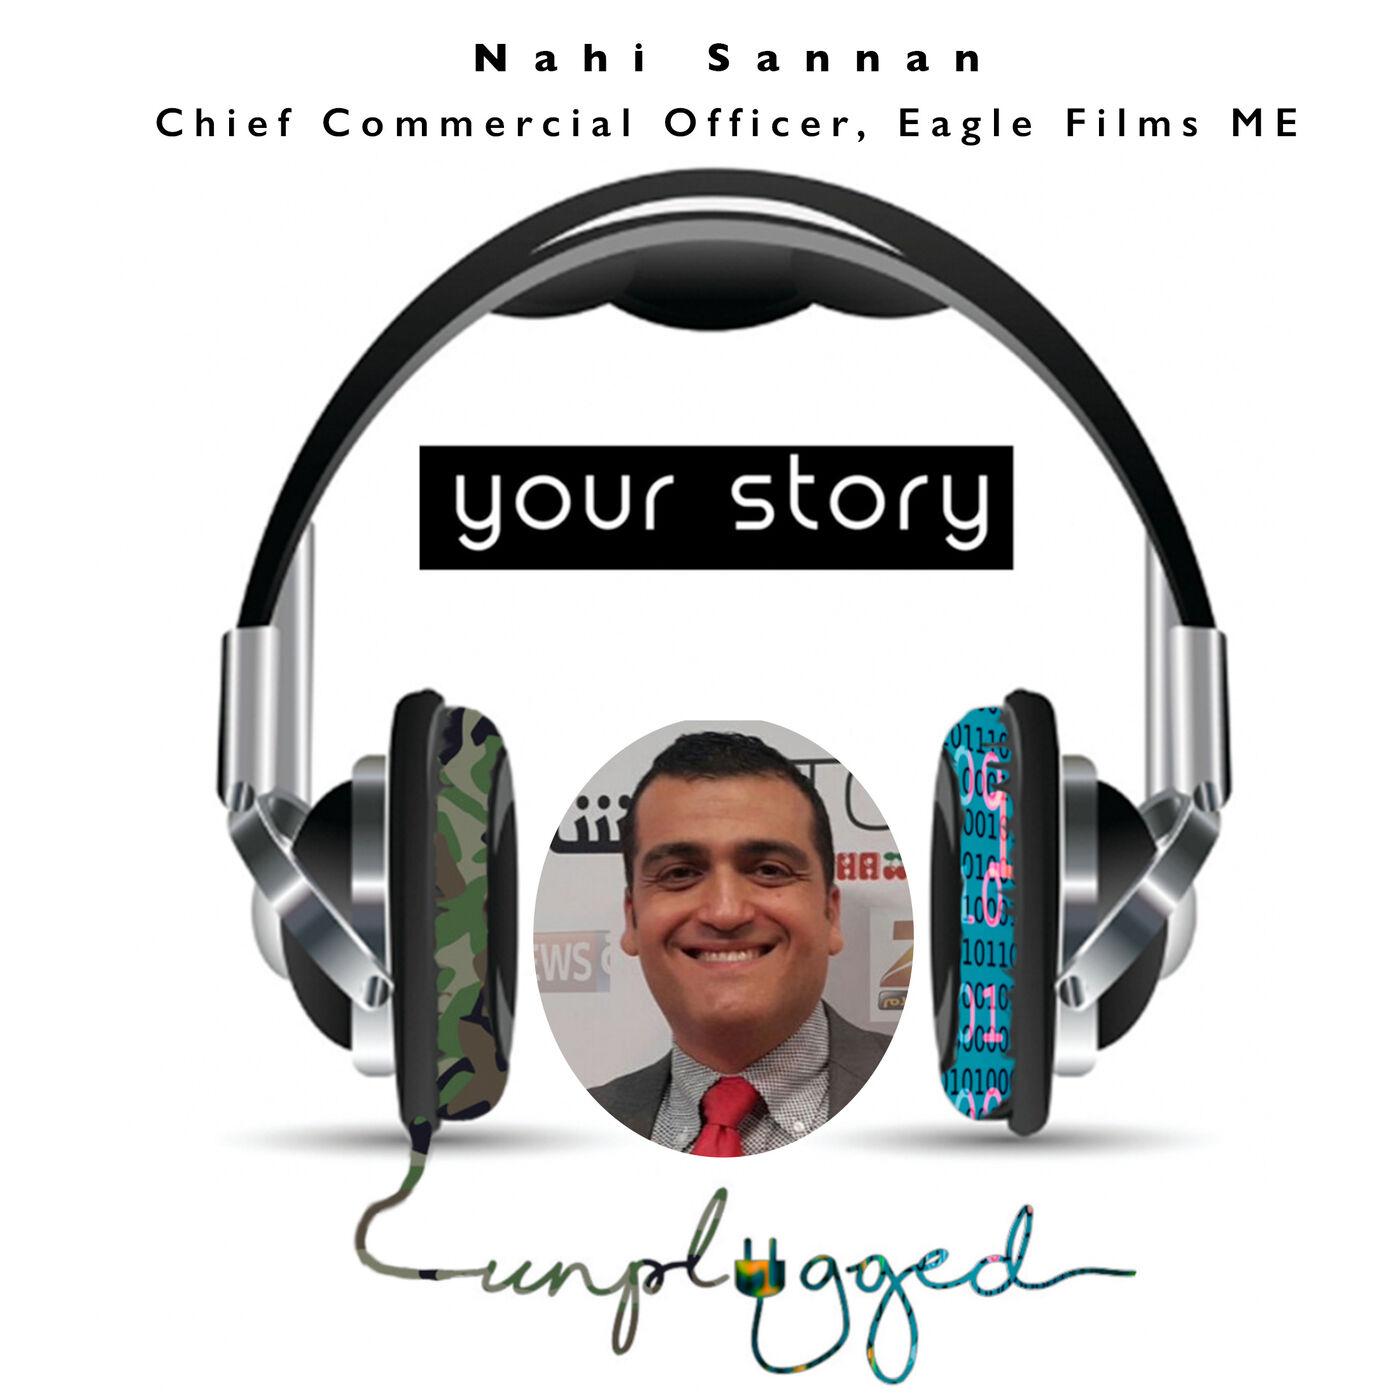 Nahi Sannan - Chief Commercial Officer, Eagle Films Middle East